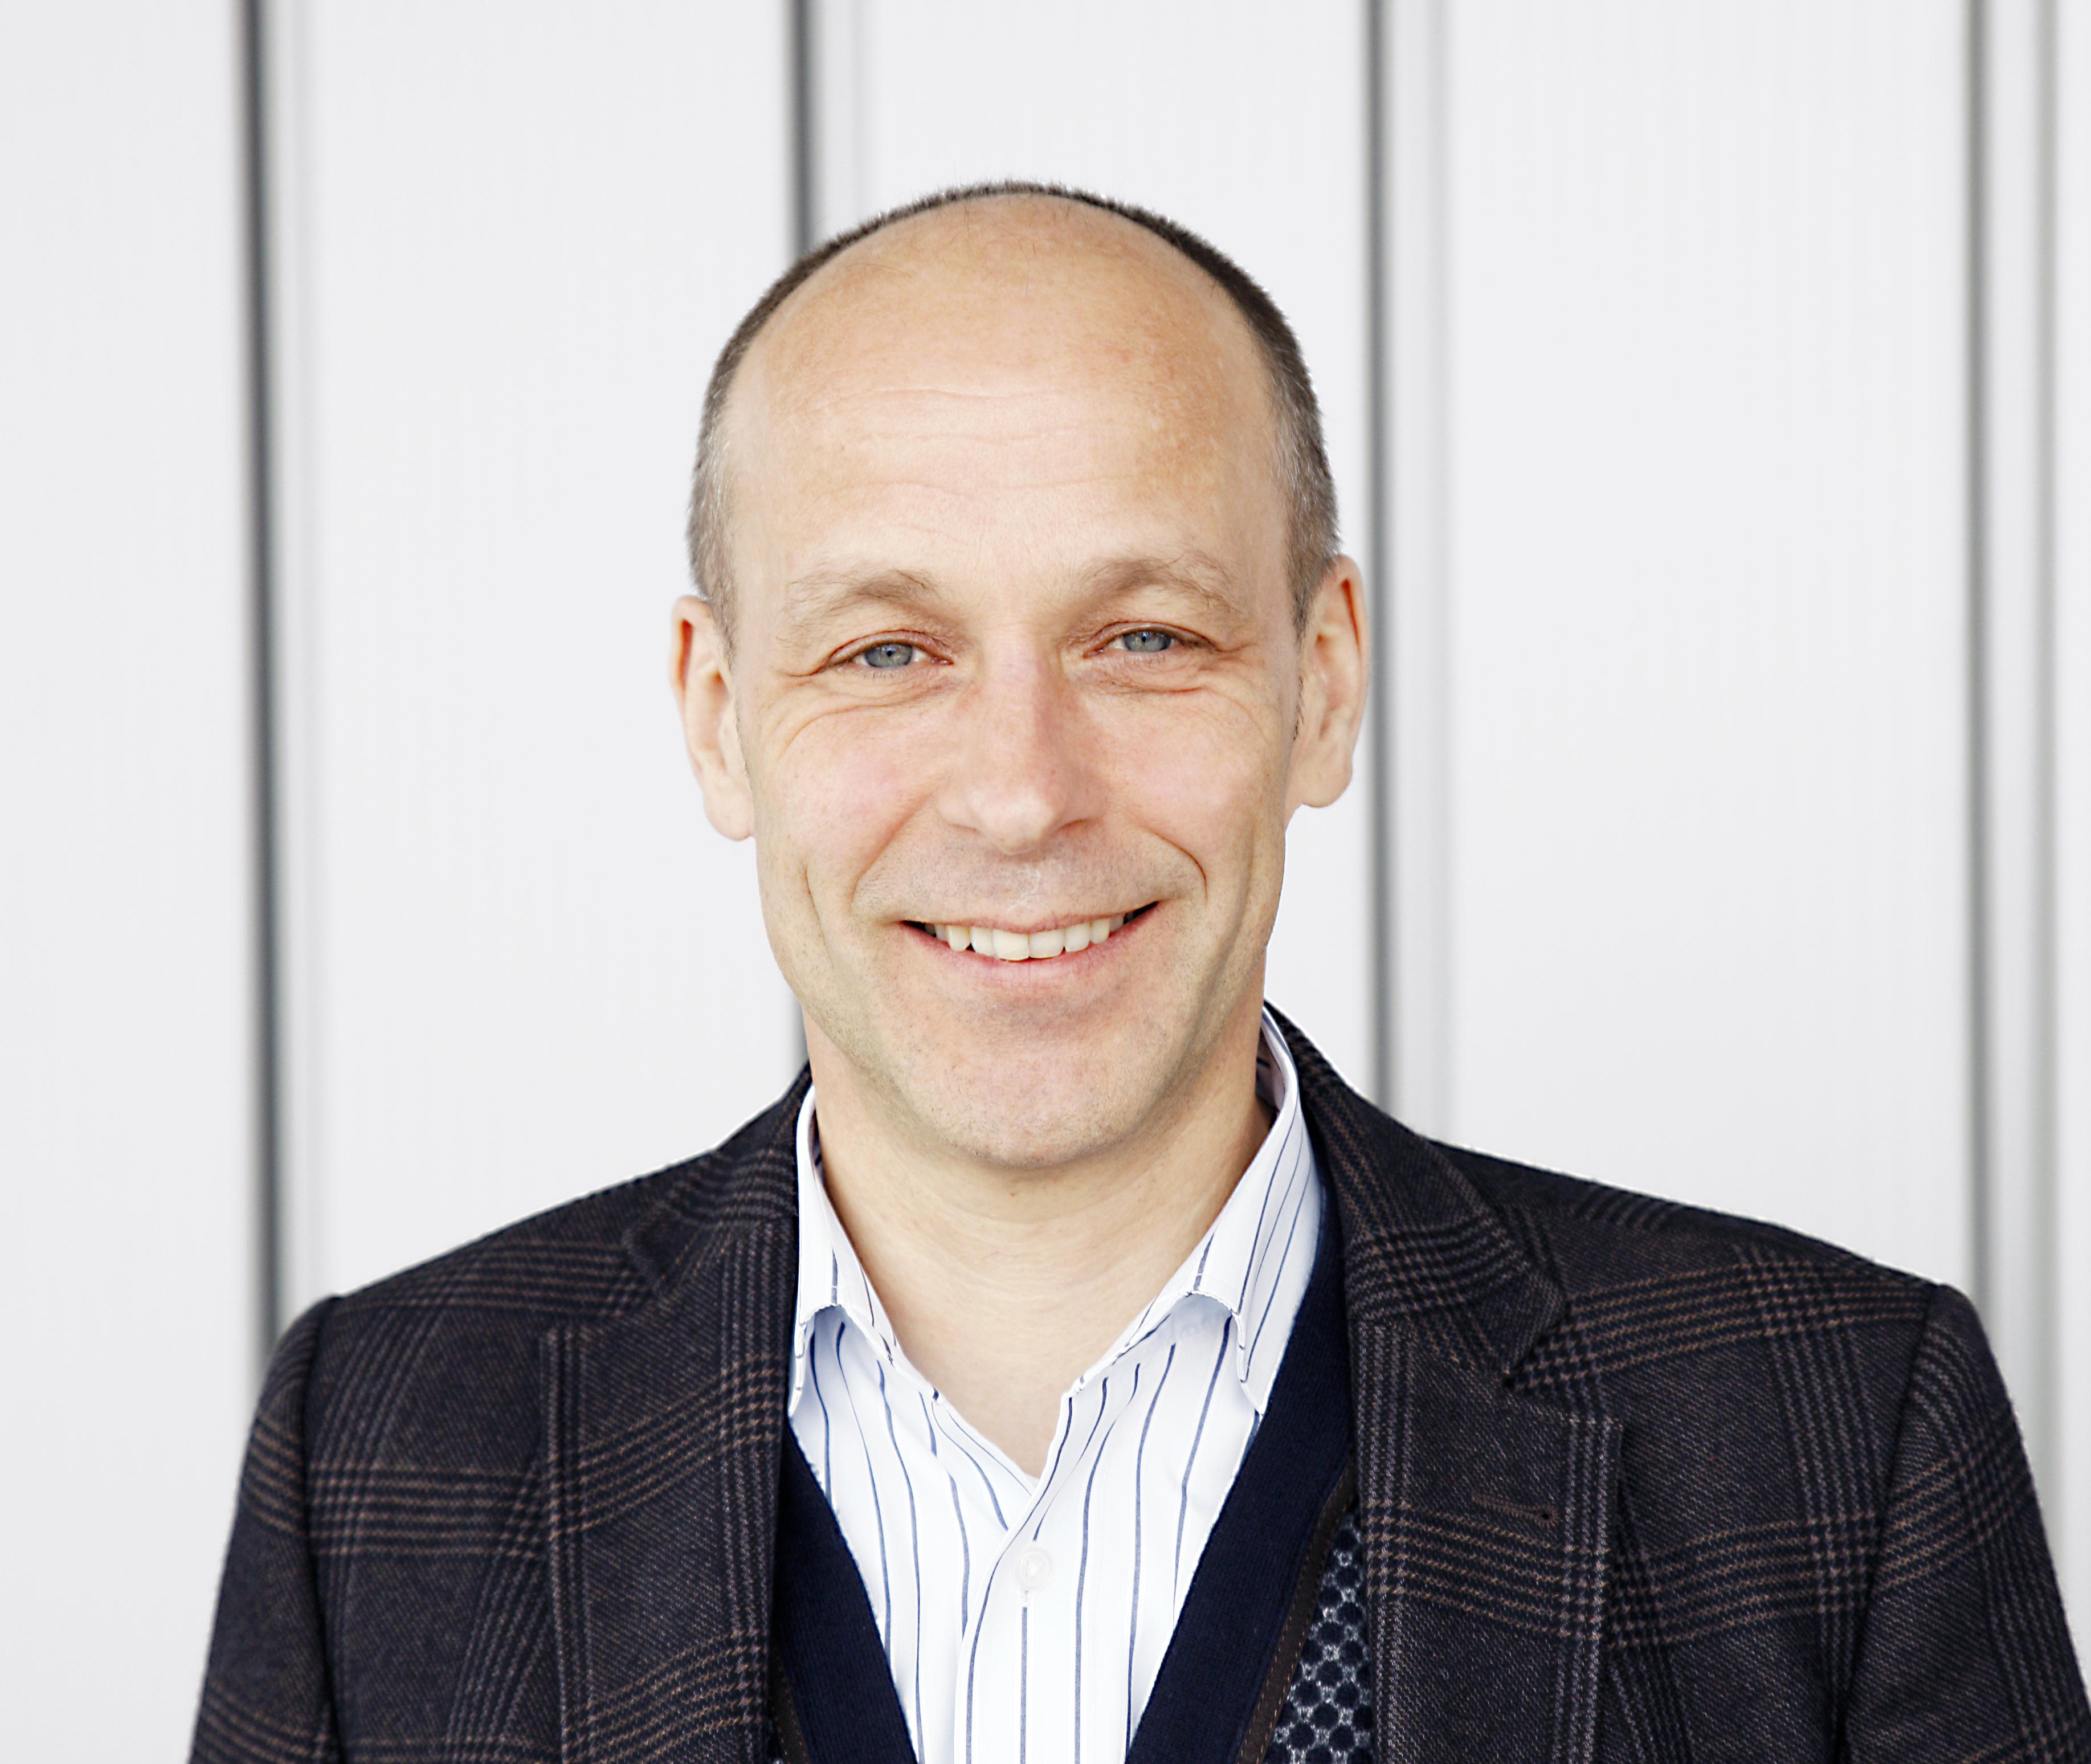 Christian Kuntze